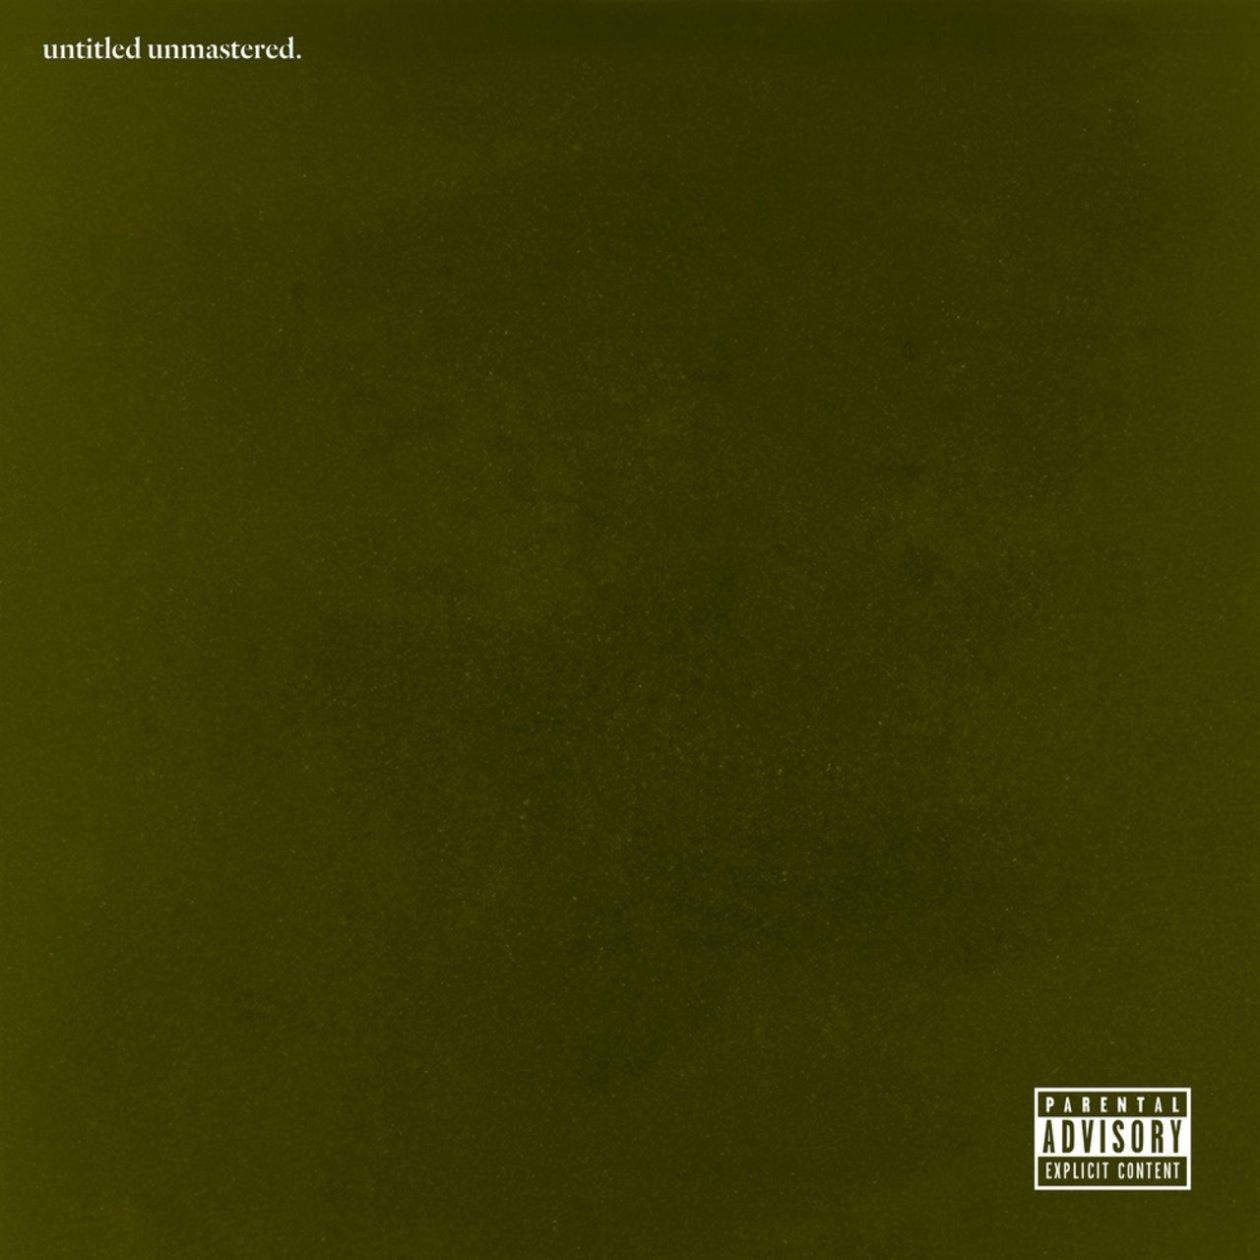 The Breakdown: Untitled Unmastered, by Kendrick Lamar